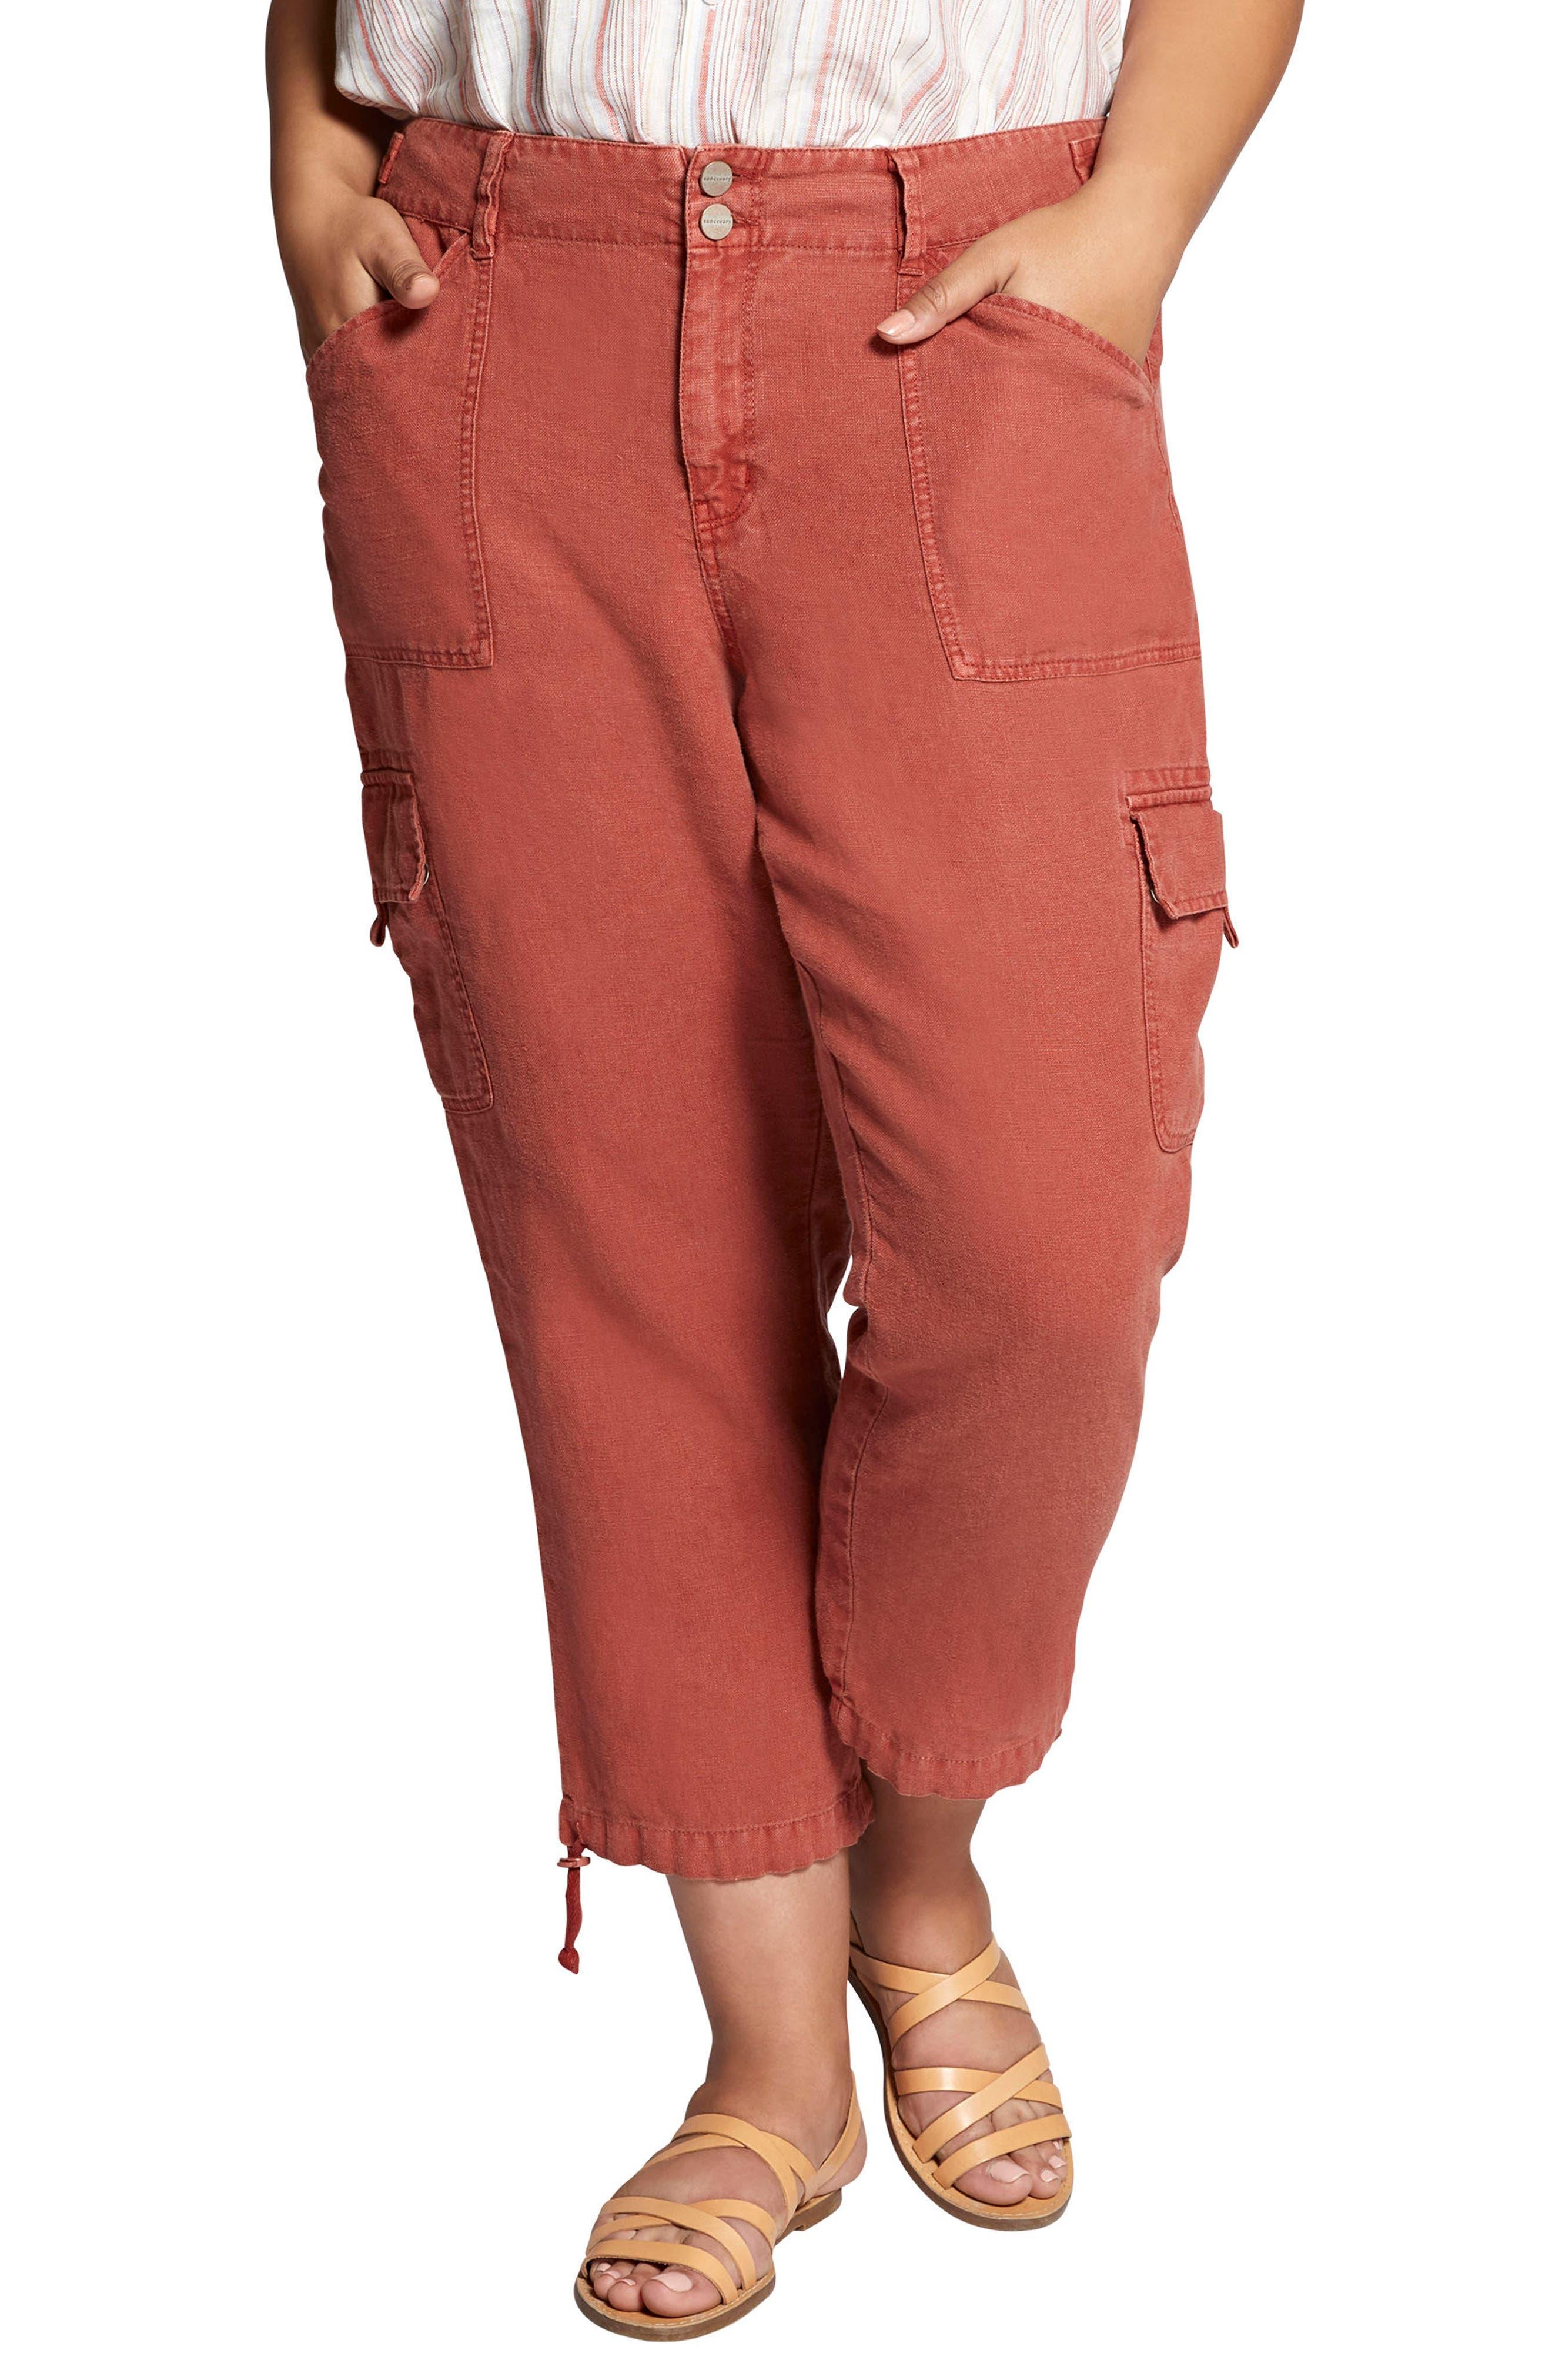 Terrain Crop Linen Cargo Pants,                             Main thumbnail 1, color,                             Terra Cotta